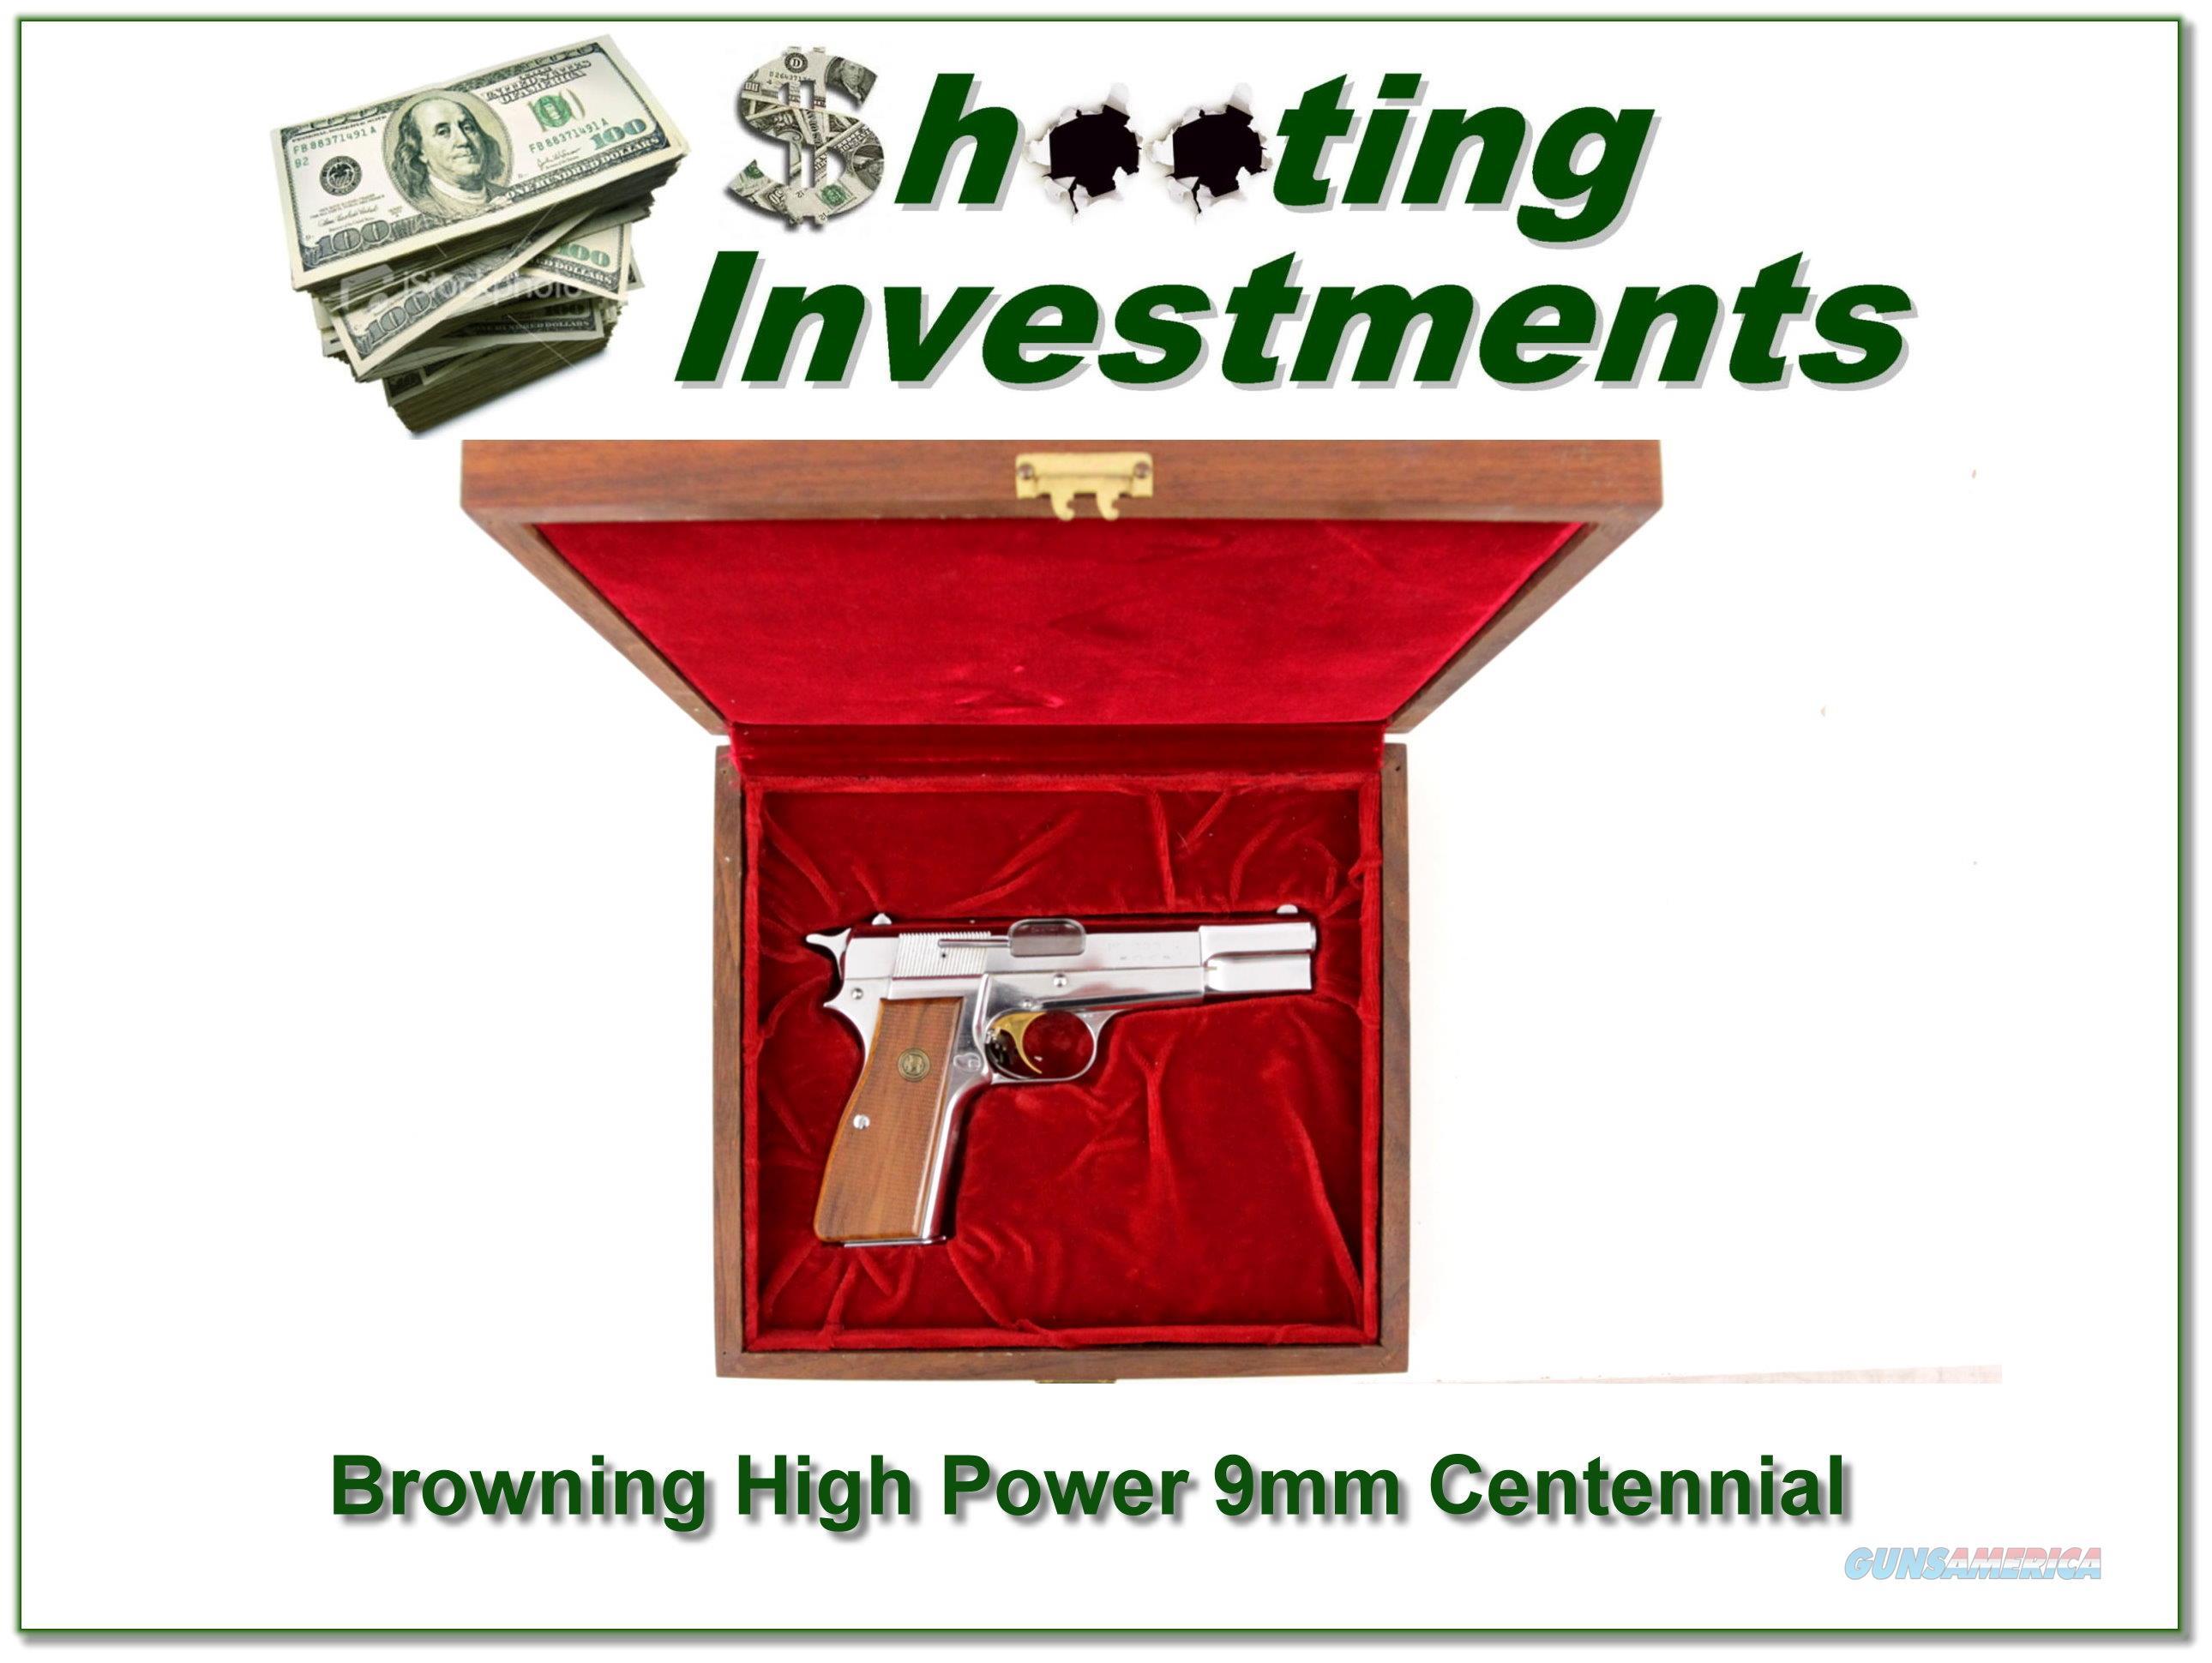 Browning High Power 9mm Centennial New in case  Guns > Pistols > Browning Pistols > Hi Power